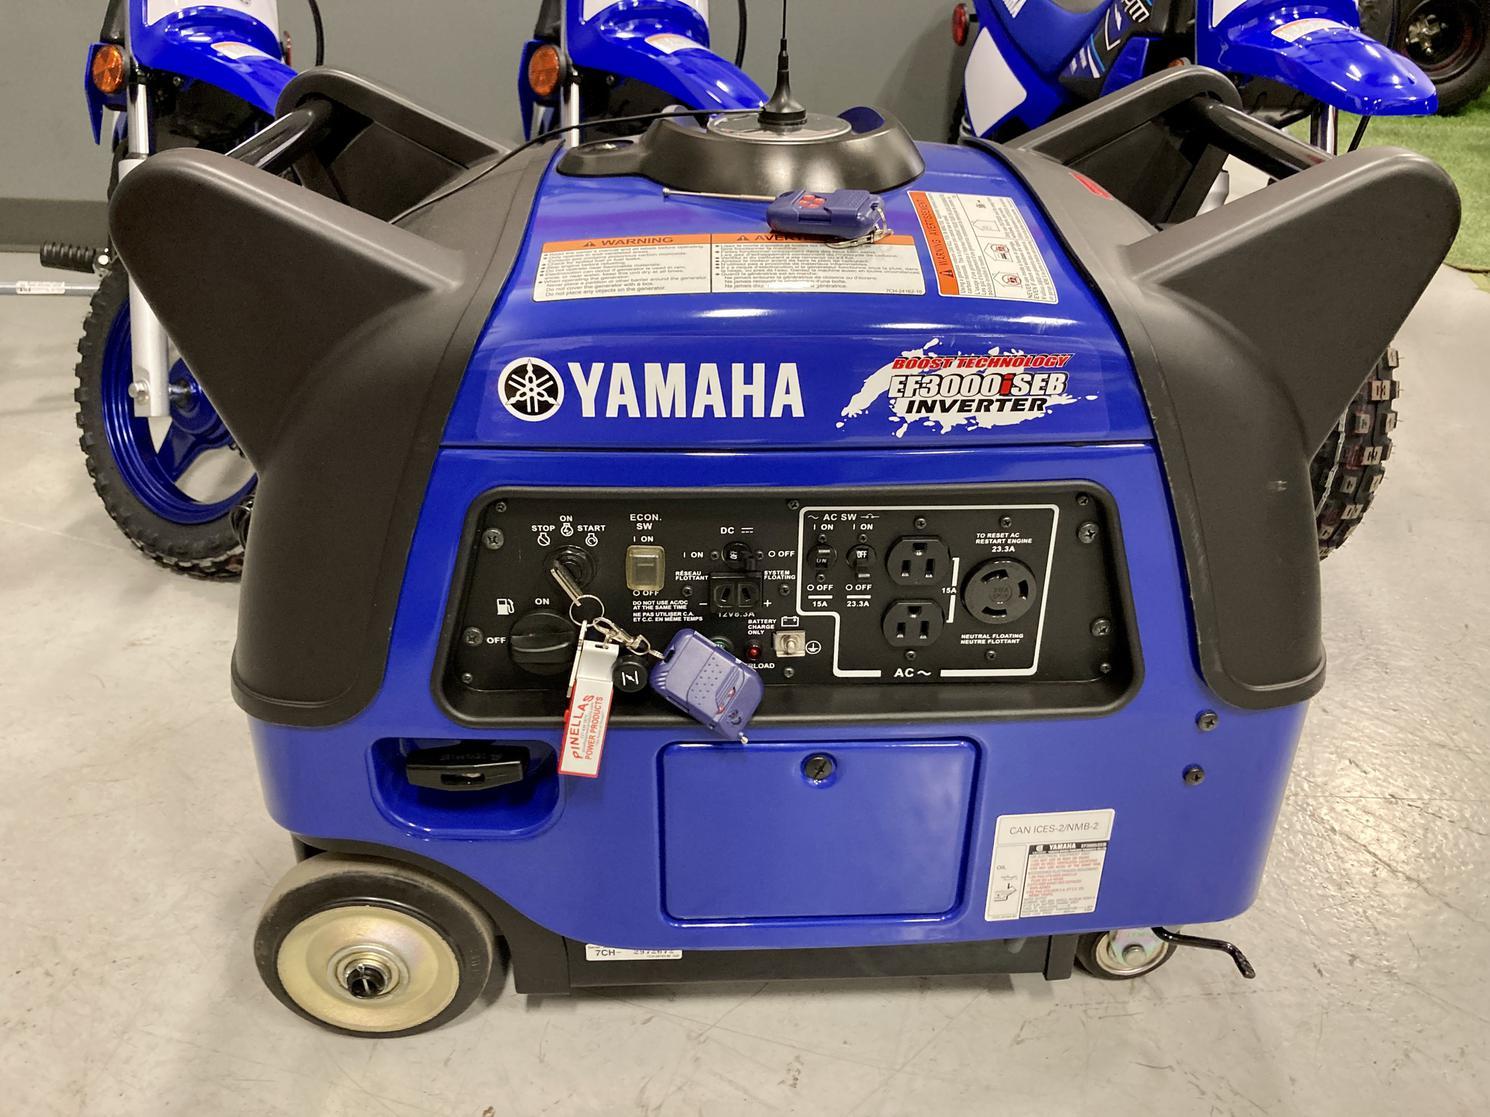 2019 Yamaha génératrice EF3000 iSEB